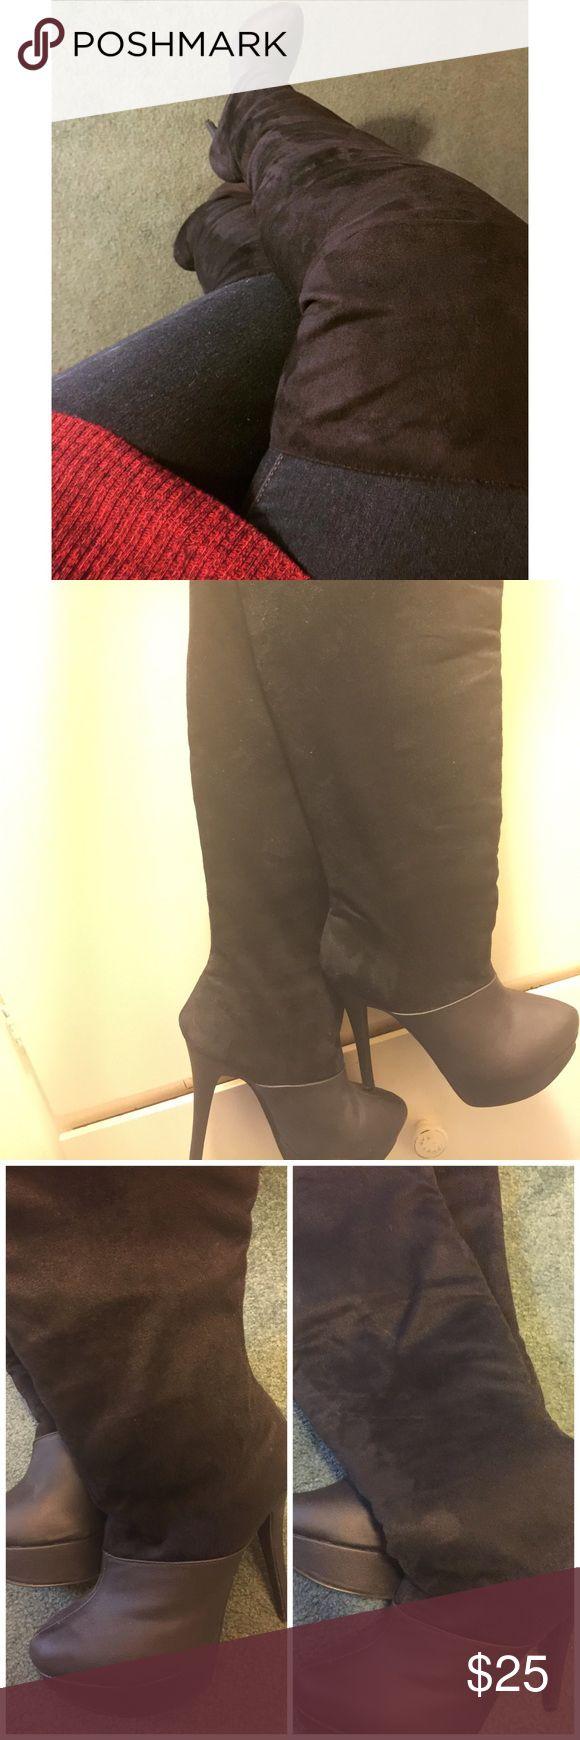 Selling this Otk heel boots on Poshmark! My username is: dmenzel. #shopmycloset #poshmark #fashion #shopping #style #forsale #Shoes